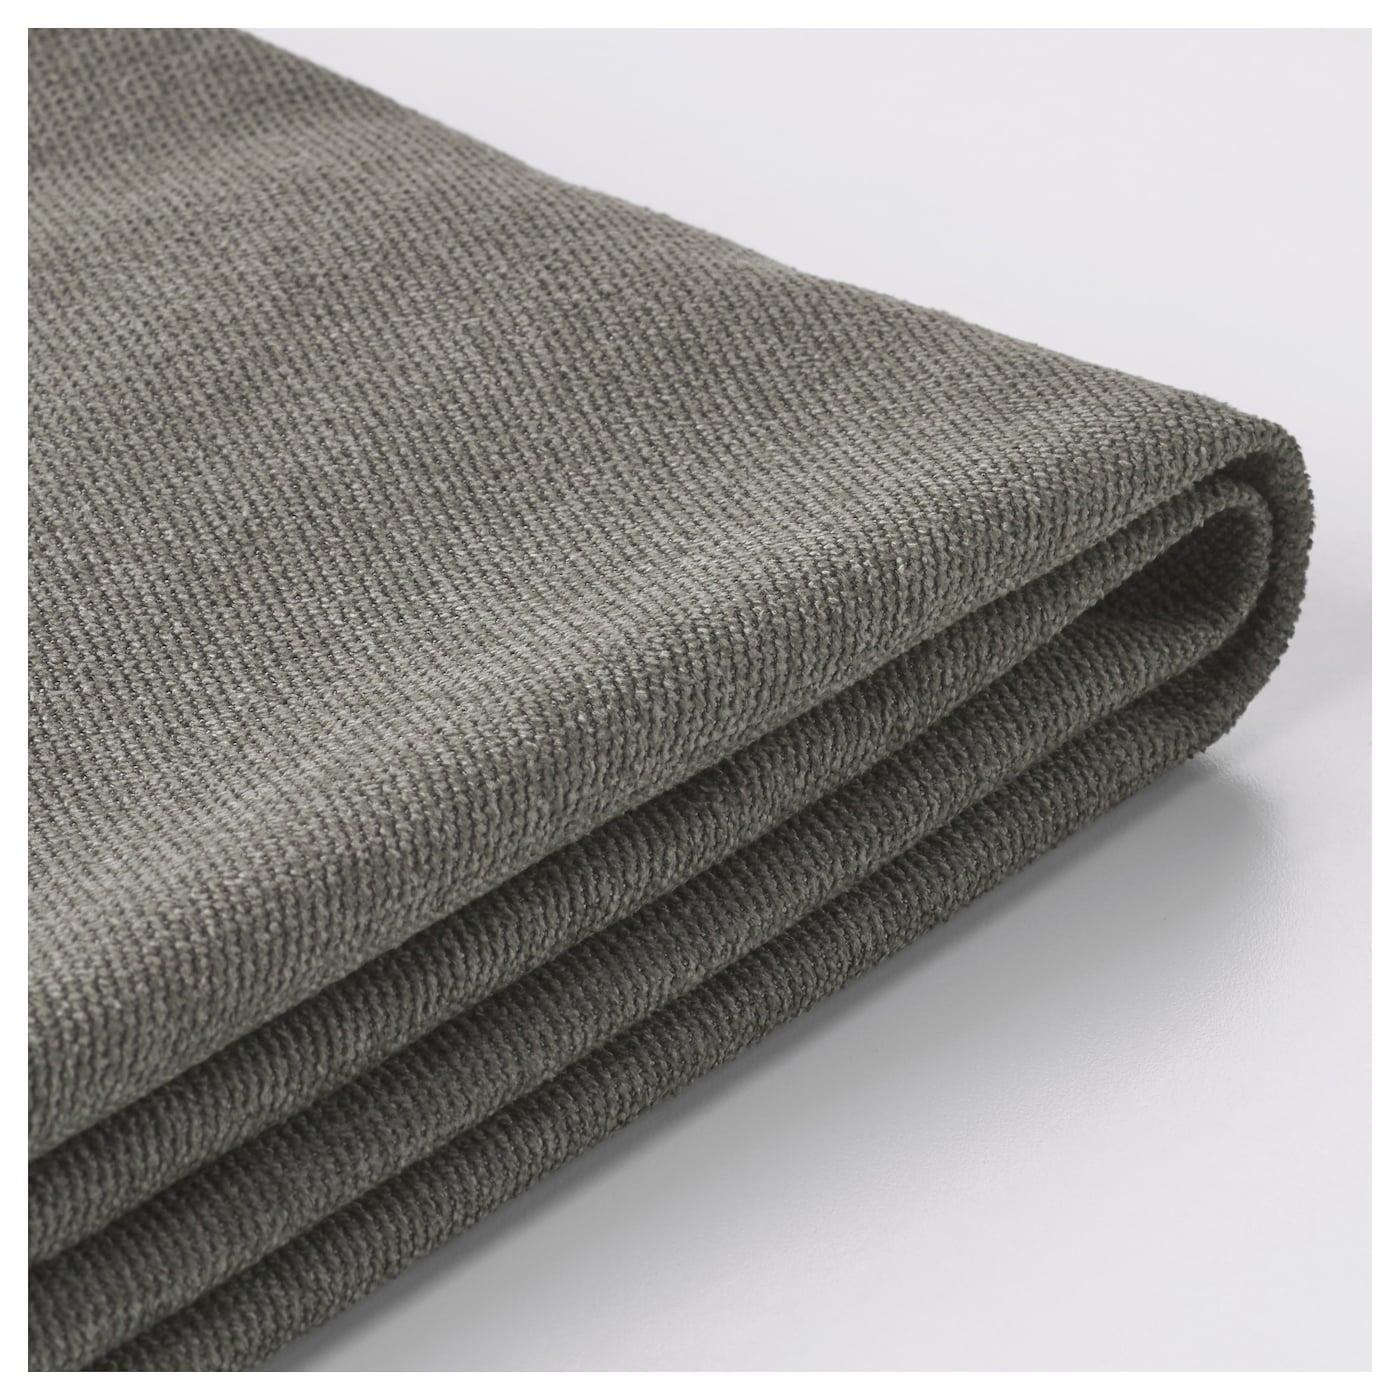 kivik housse de canap 3pla borred gris vert ikea. Black Bedroom Furniture Sets. Home Design Ideas